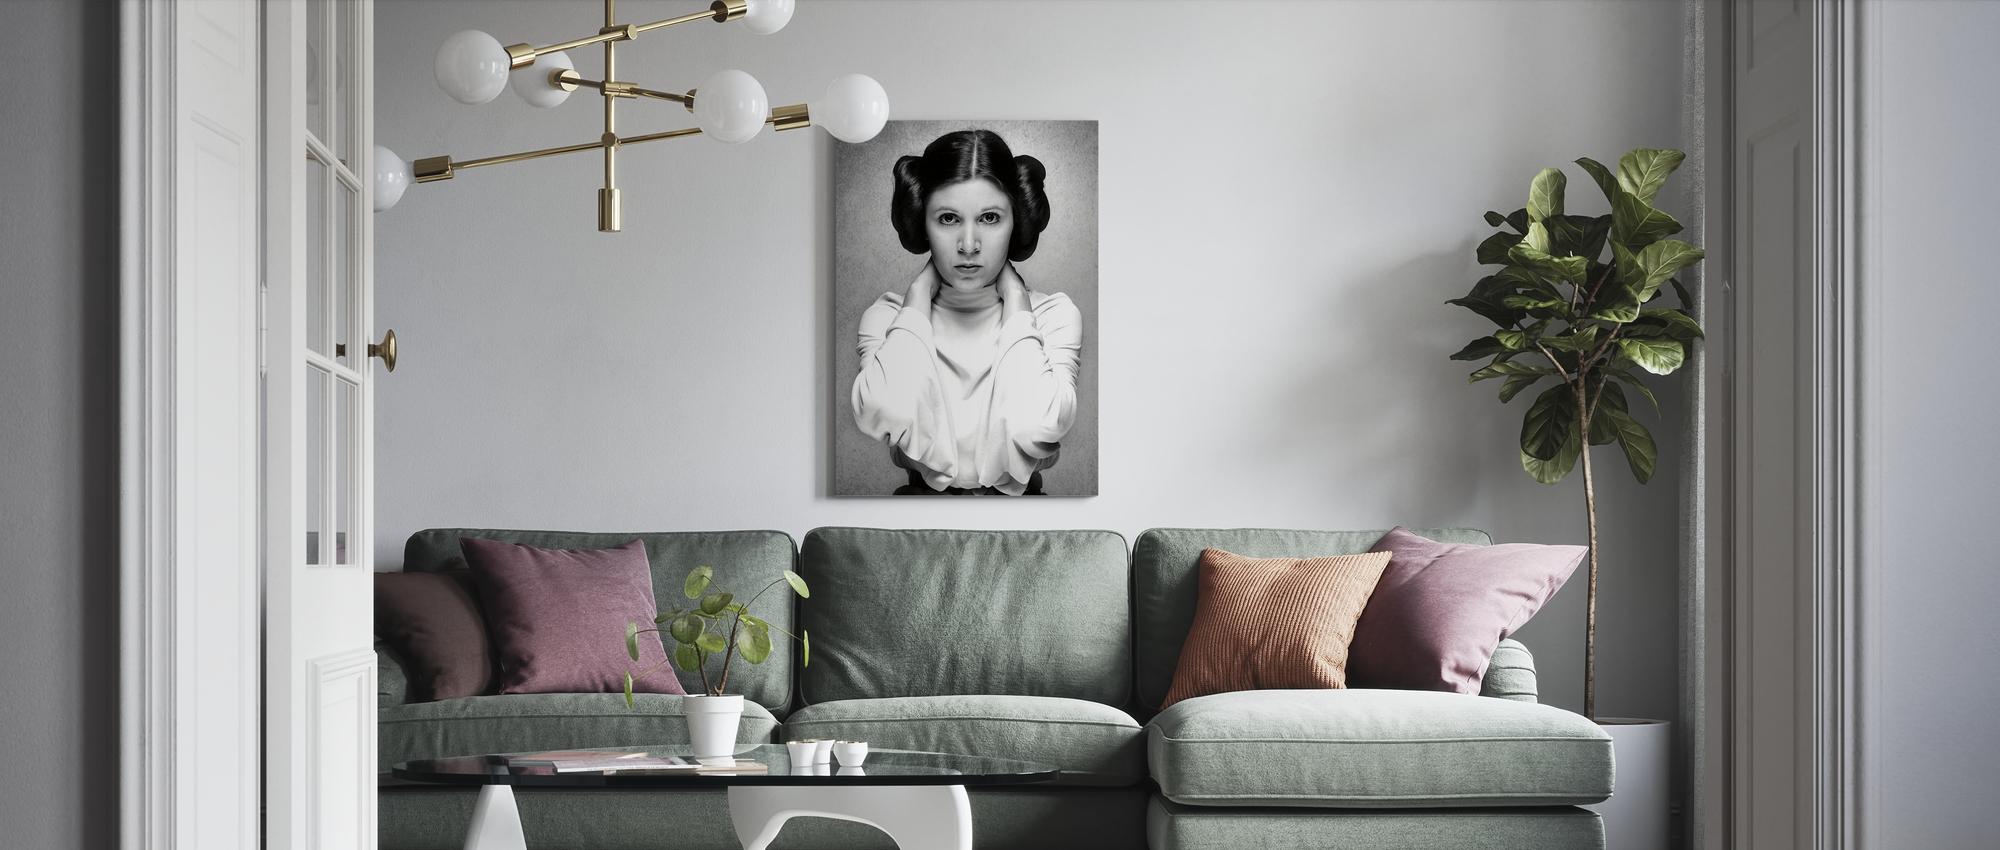 Leinwand Leinwanddruck Prinzessin Leia Organa Artwork Film Plakat Original Gerahmt Fine Art Malerei Poster Pop-Art aus Star Wars Carrie Fisher